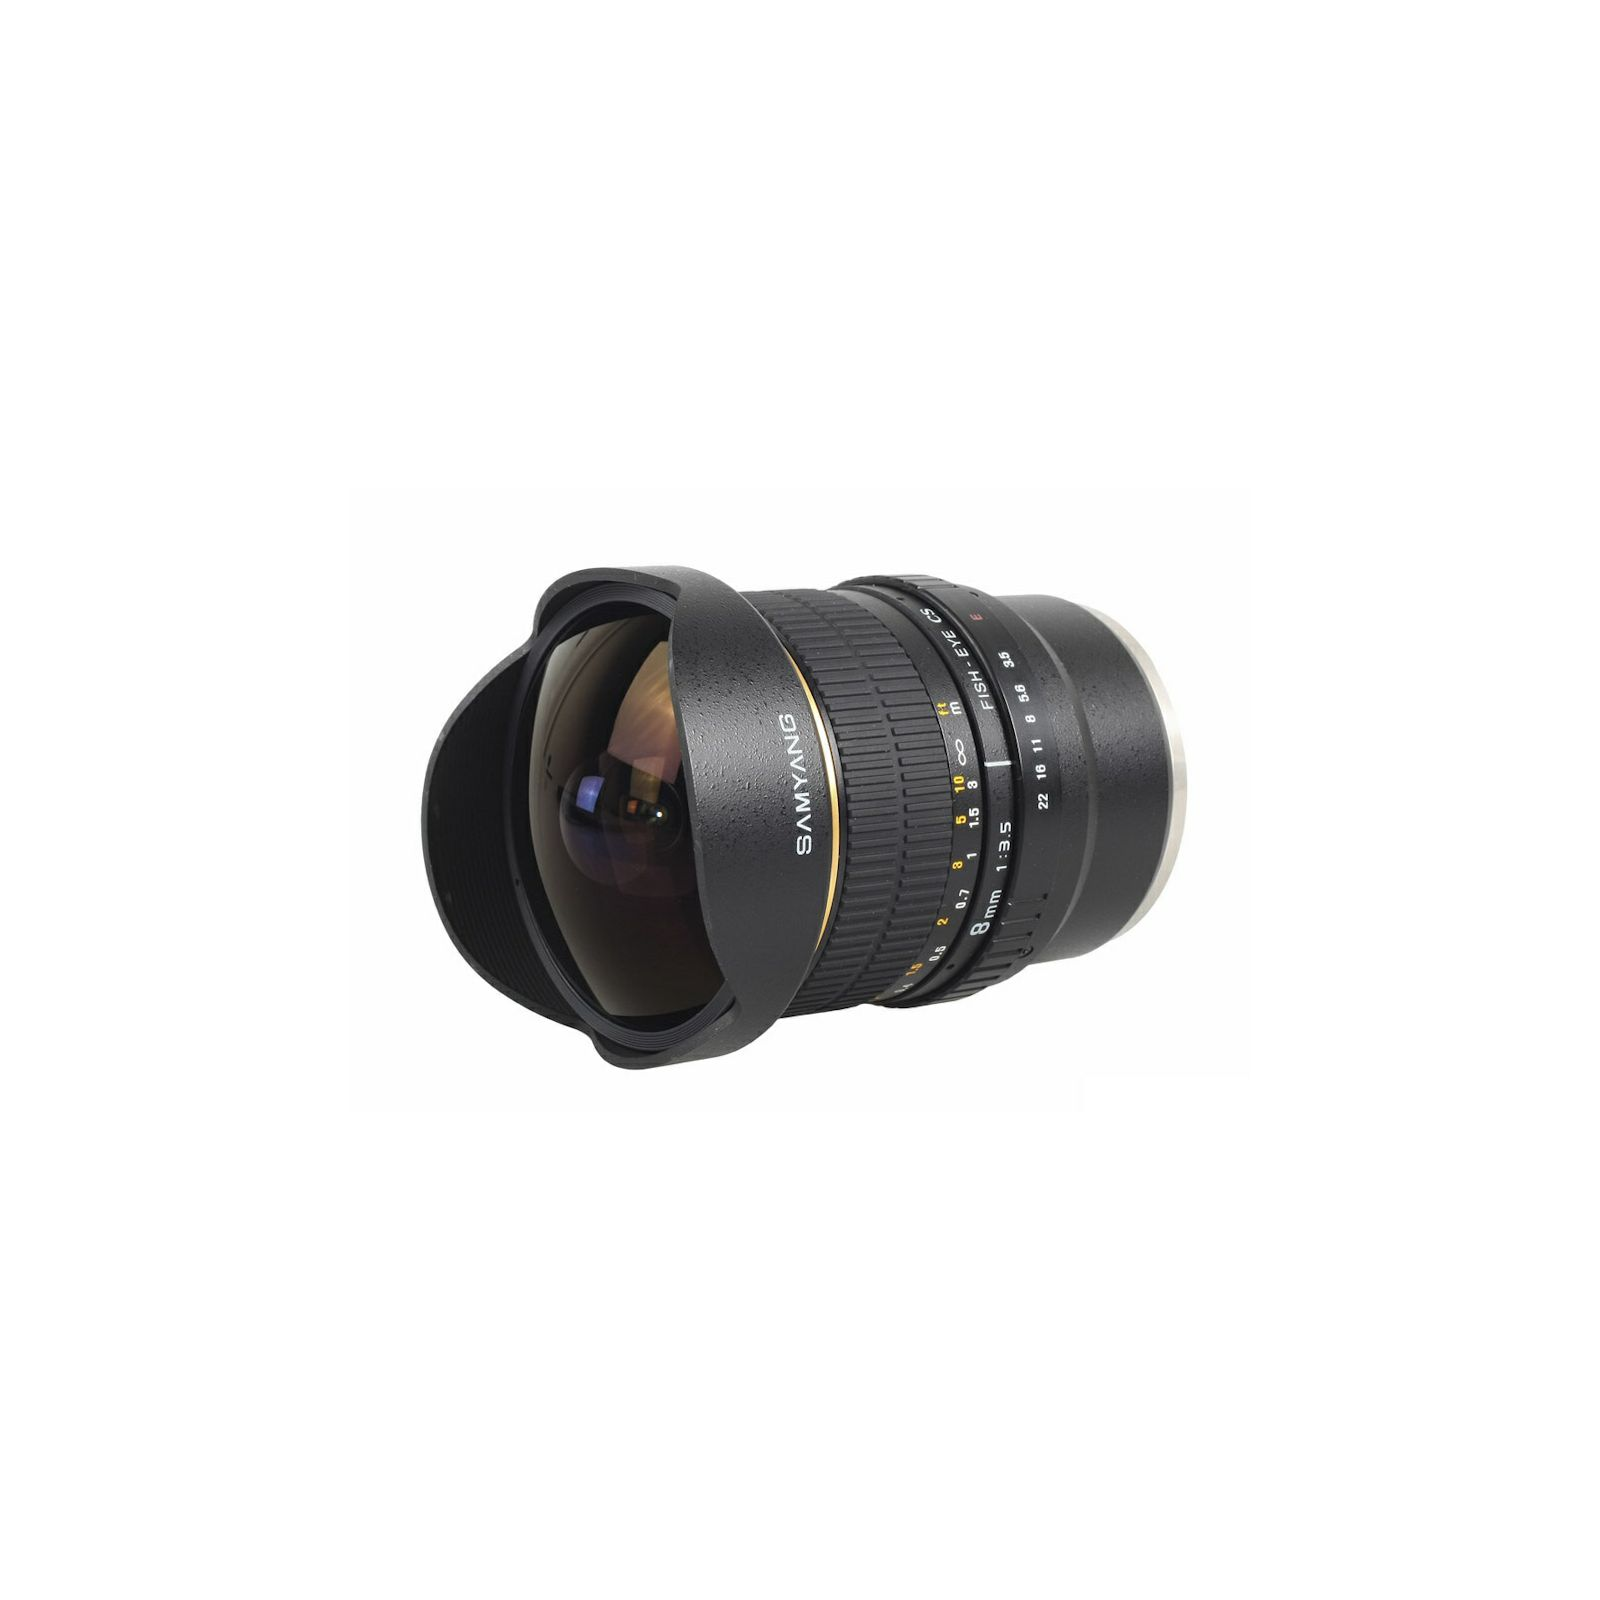 Samyang 8mm F3,5 Sony Fish-eye E - Mount VG-10 Edition